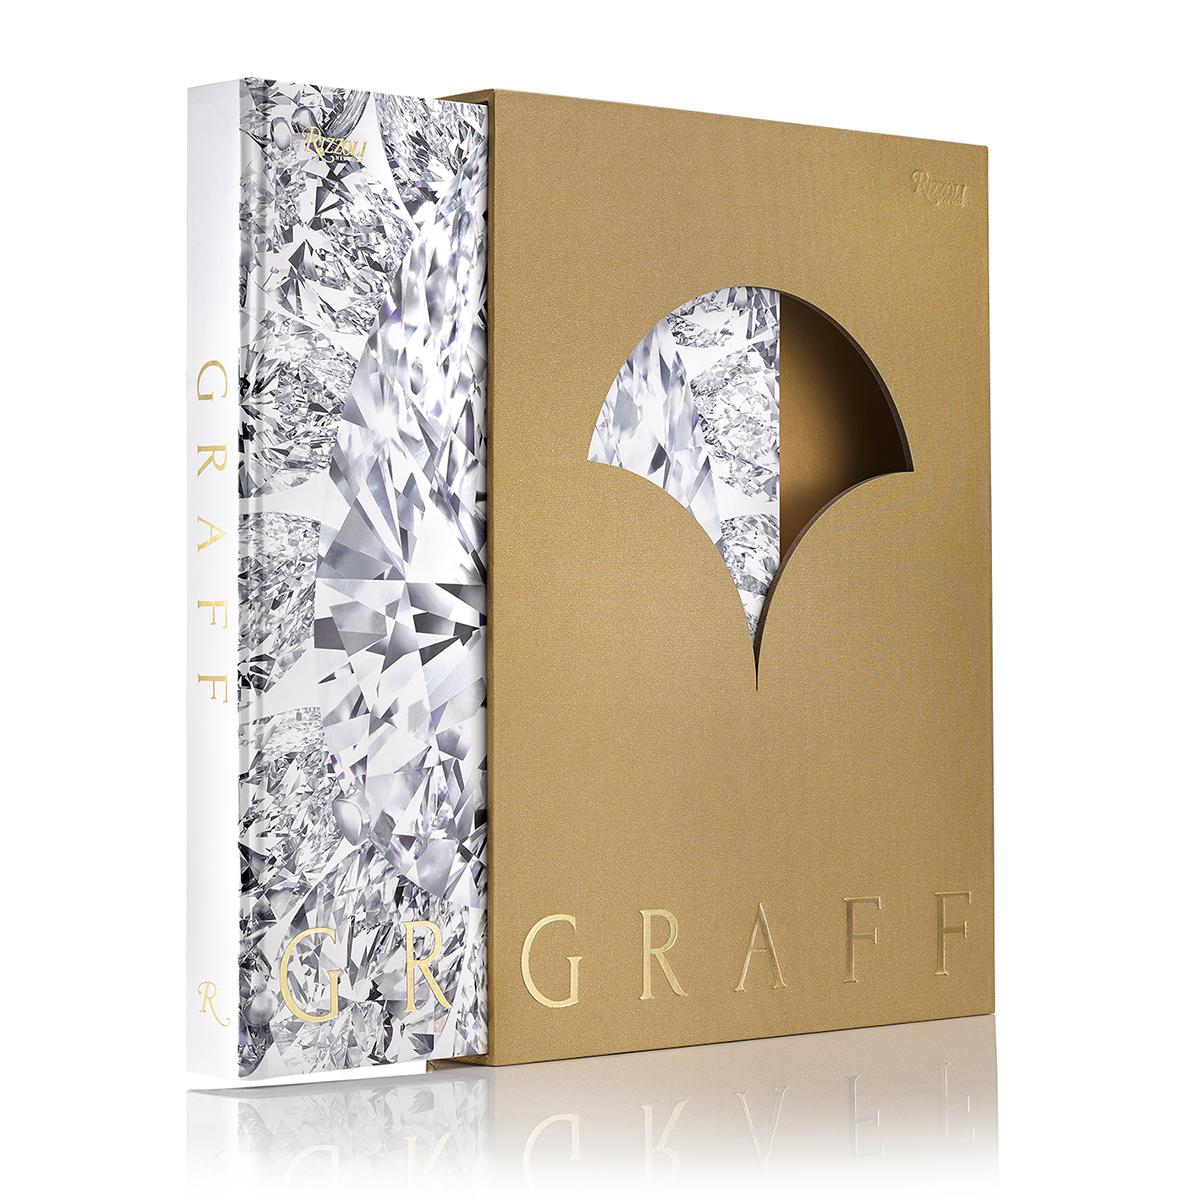 Graff book 3